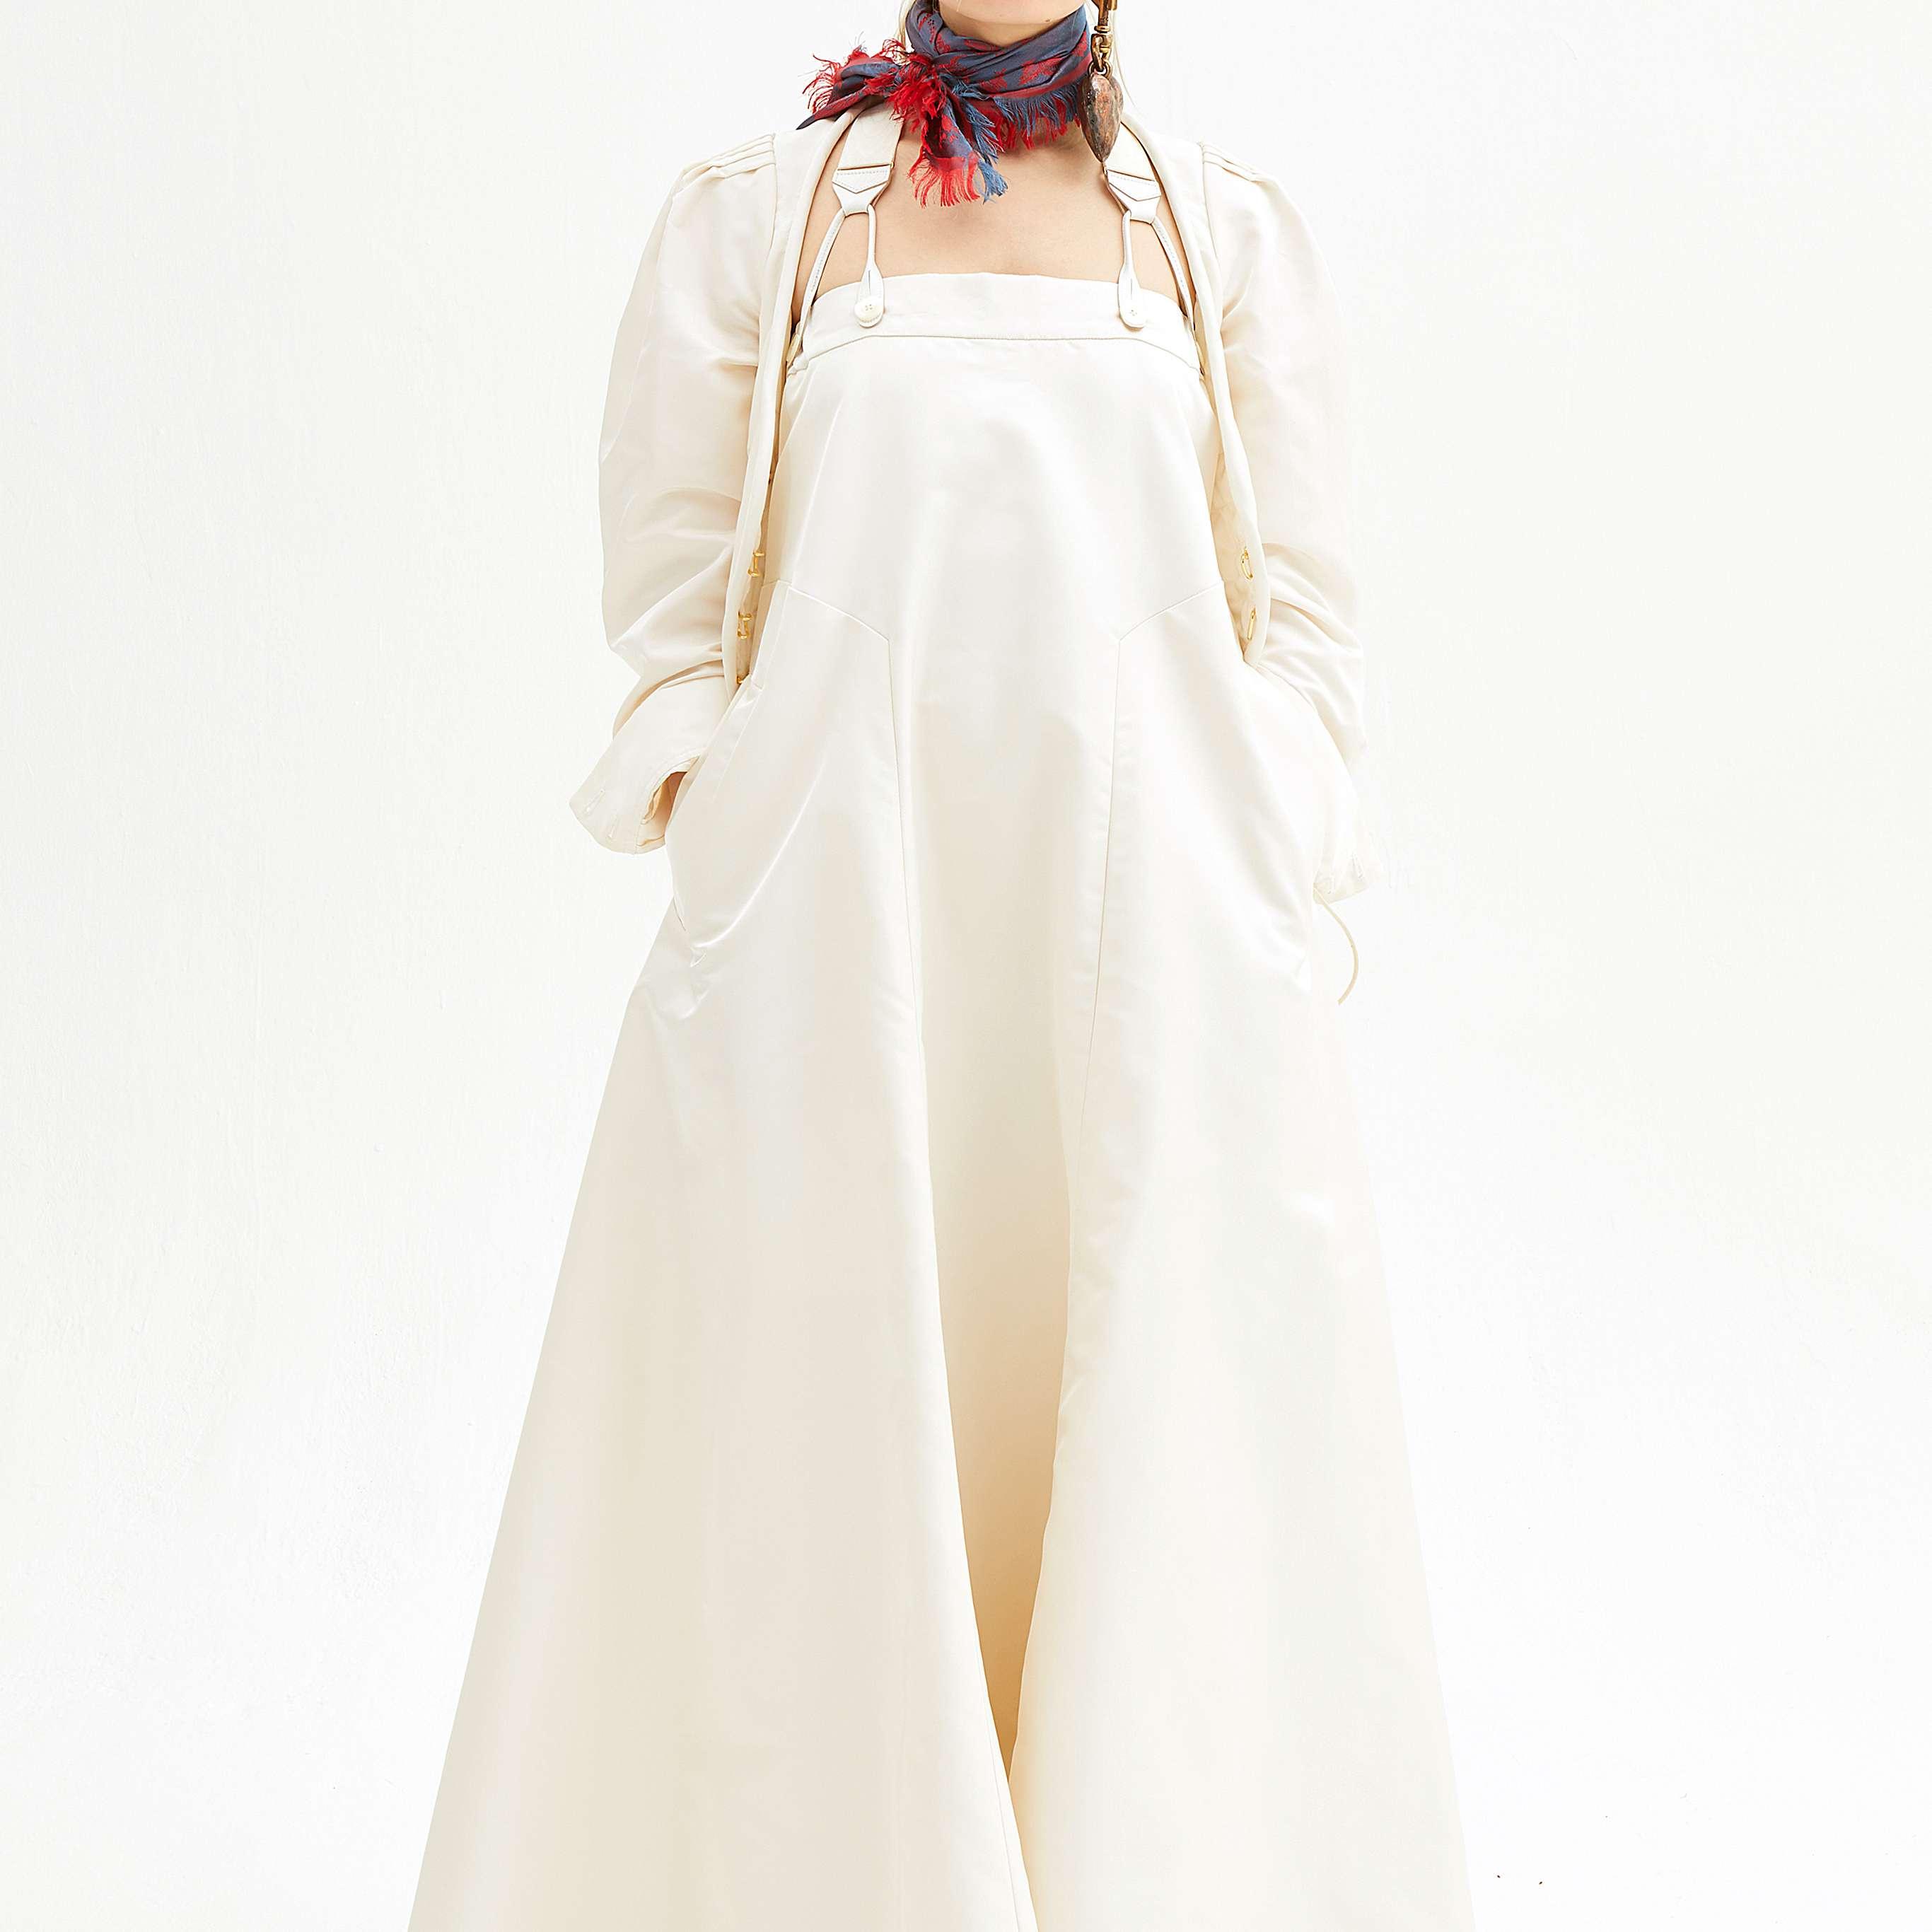 Viviene Westwood Wedding Dresses.Andreas Kronthaler For Vivienne Westwood Fall 2018